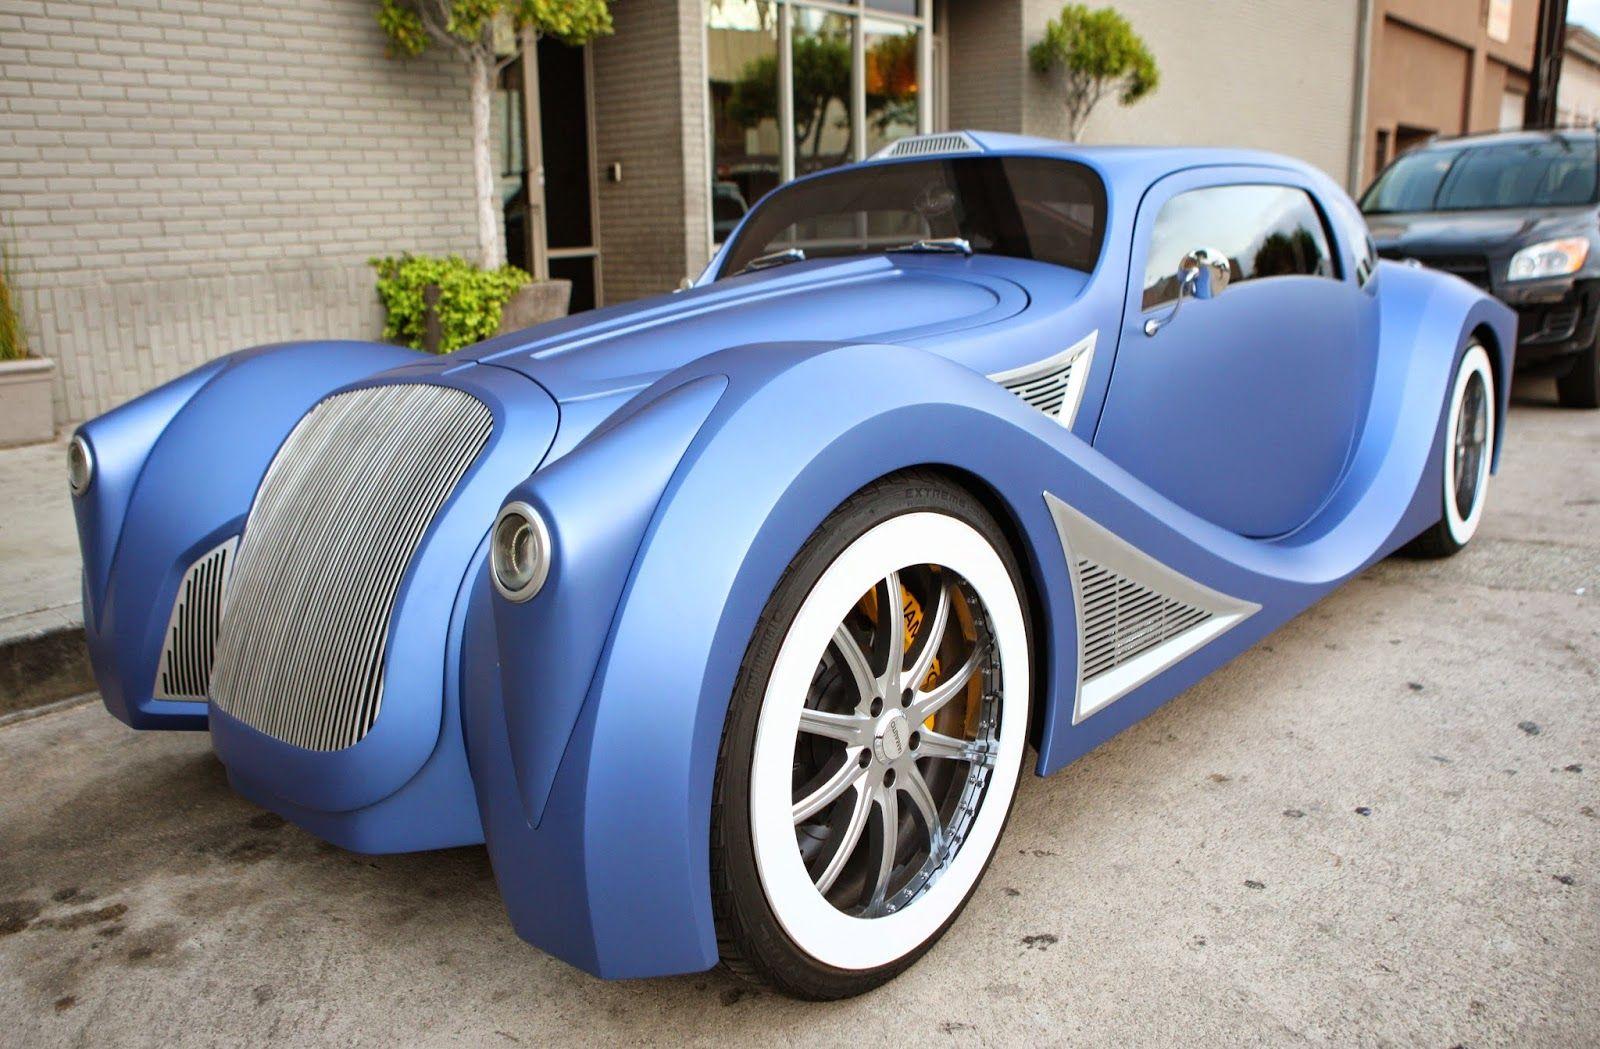 Will.i.am Custom Car Will.i.am Custom Made Car price $900,000 ...